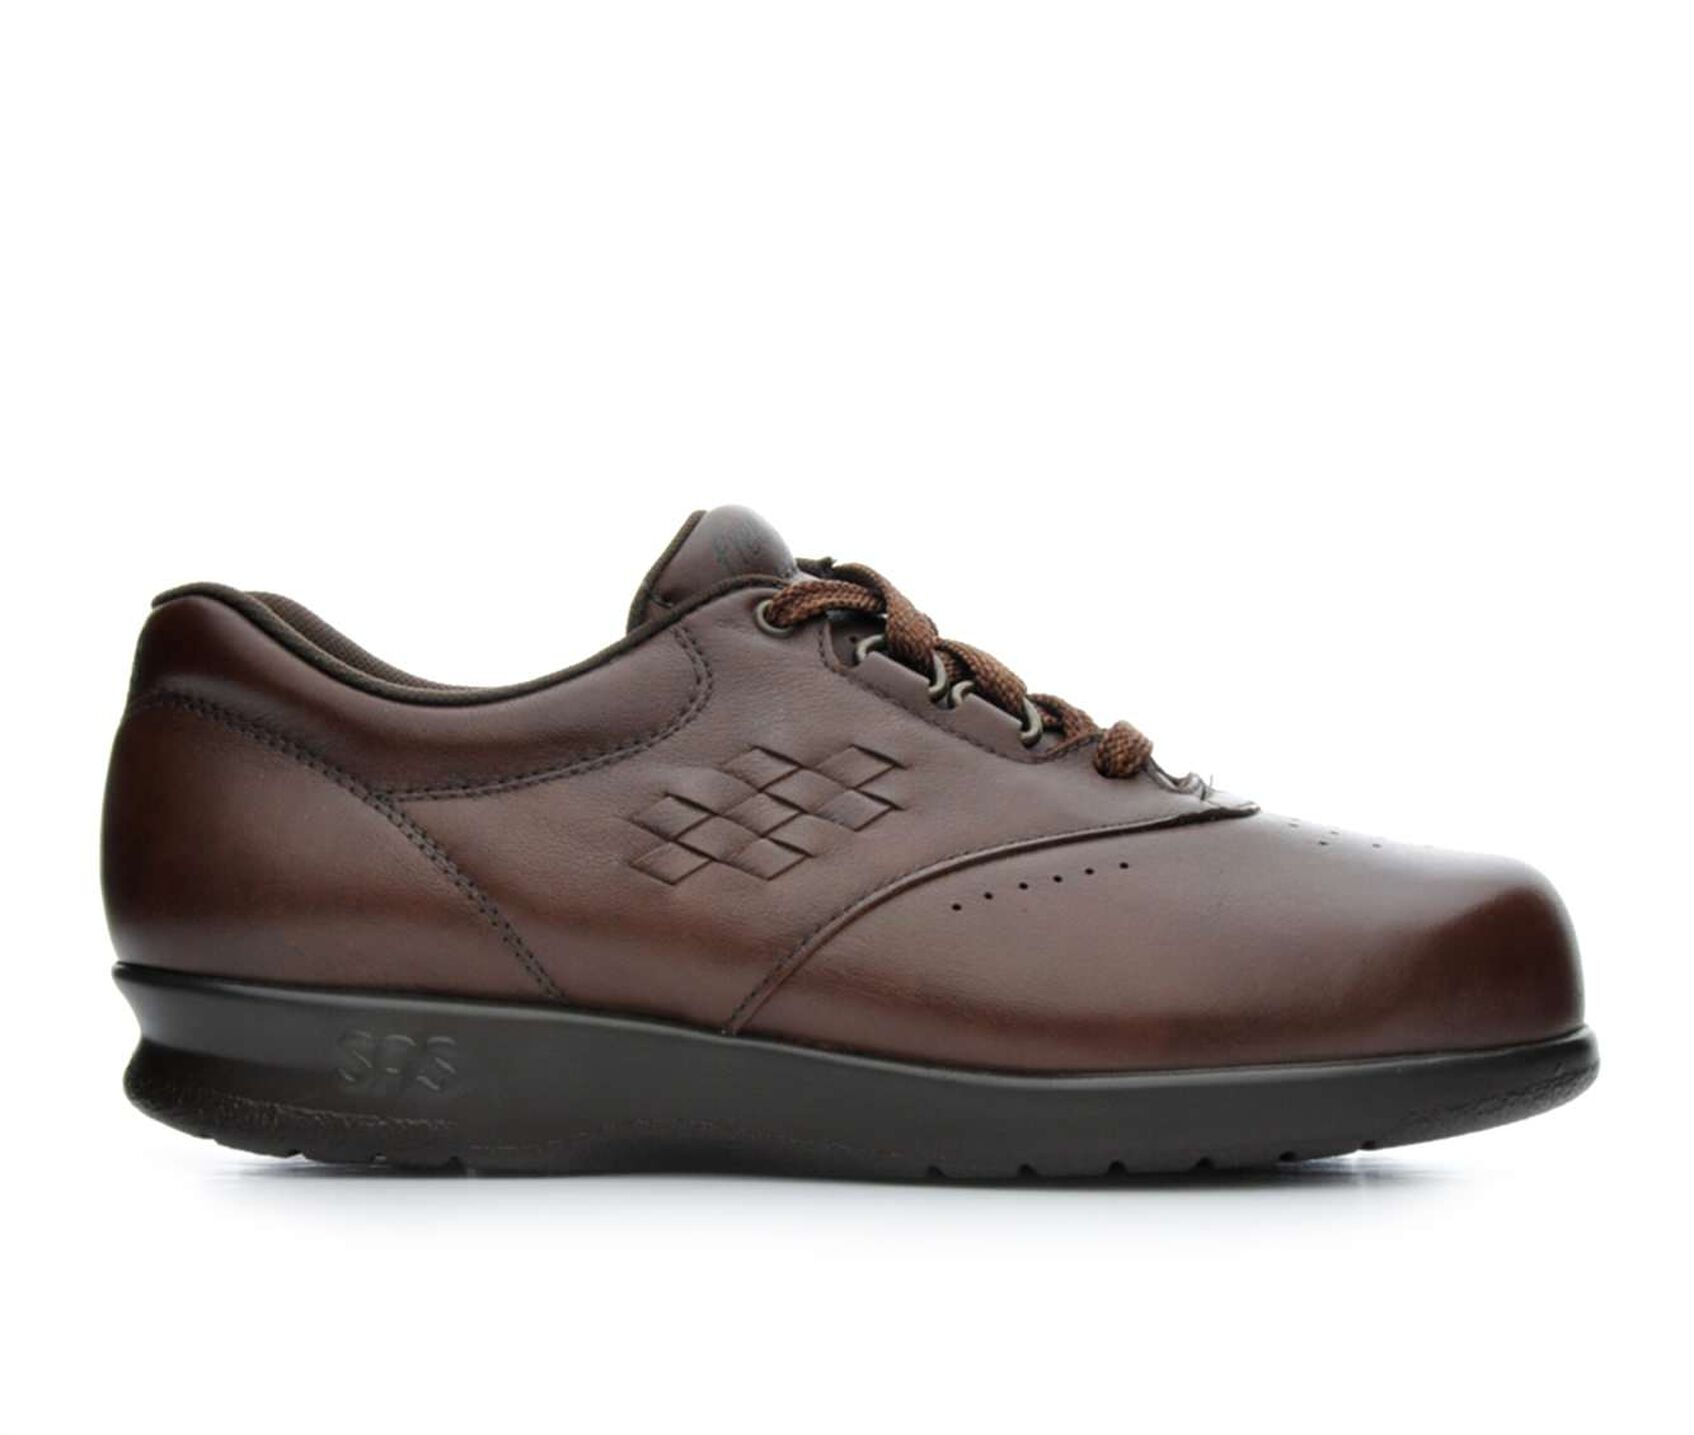 s sas freetime comfort w walking shoes